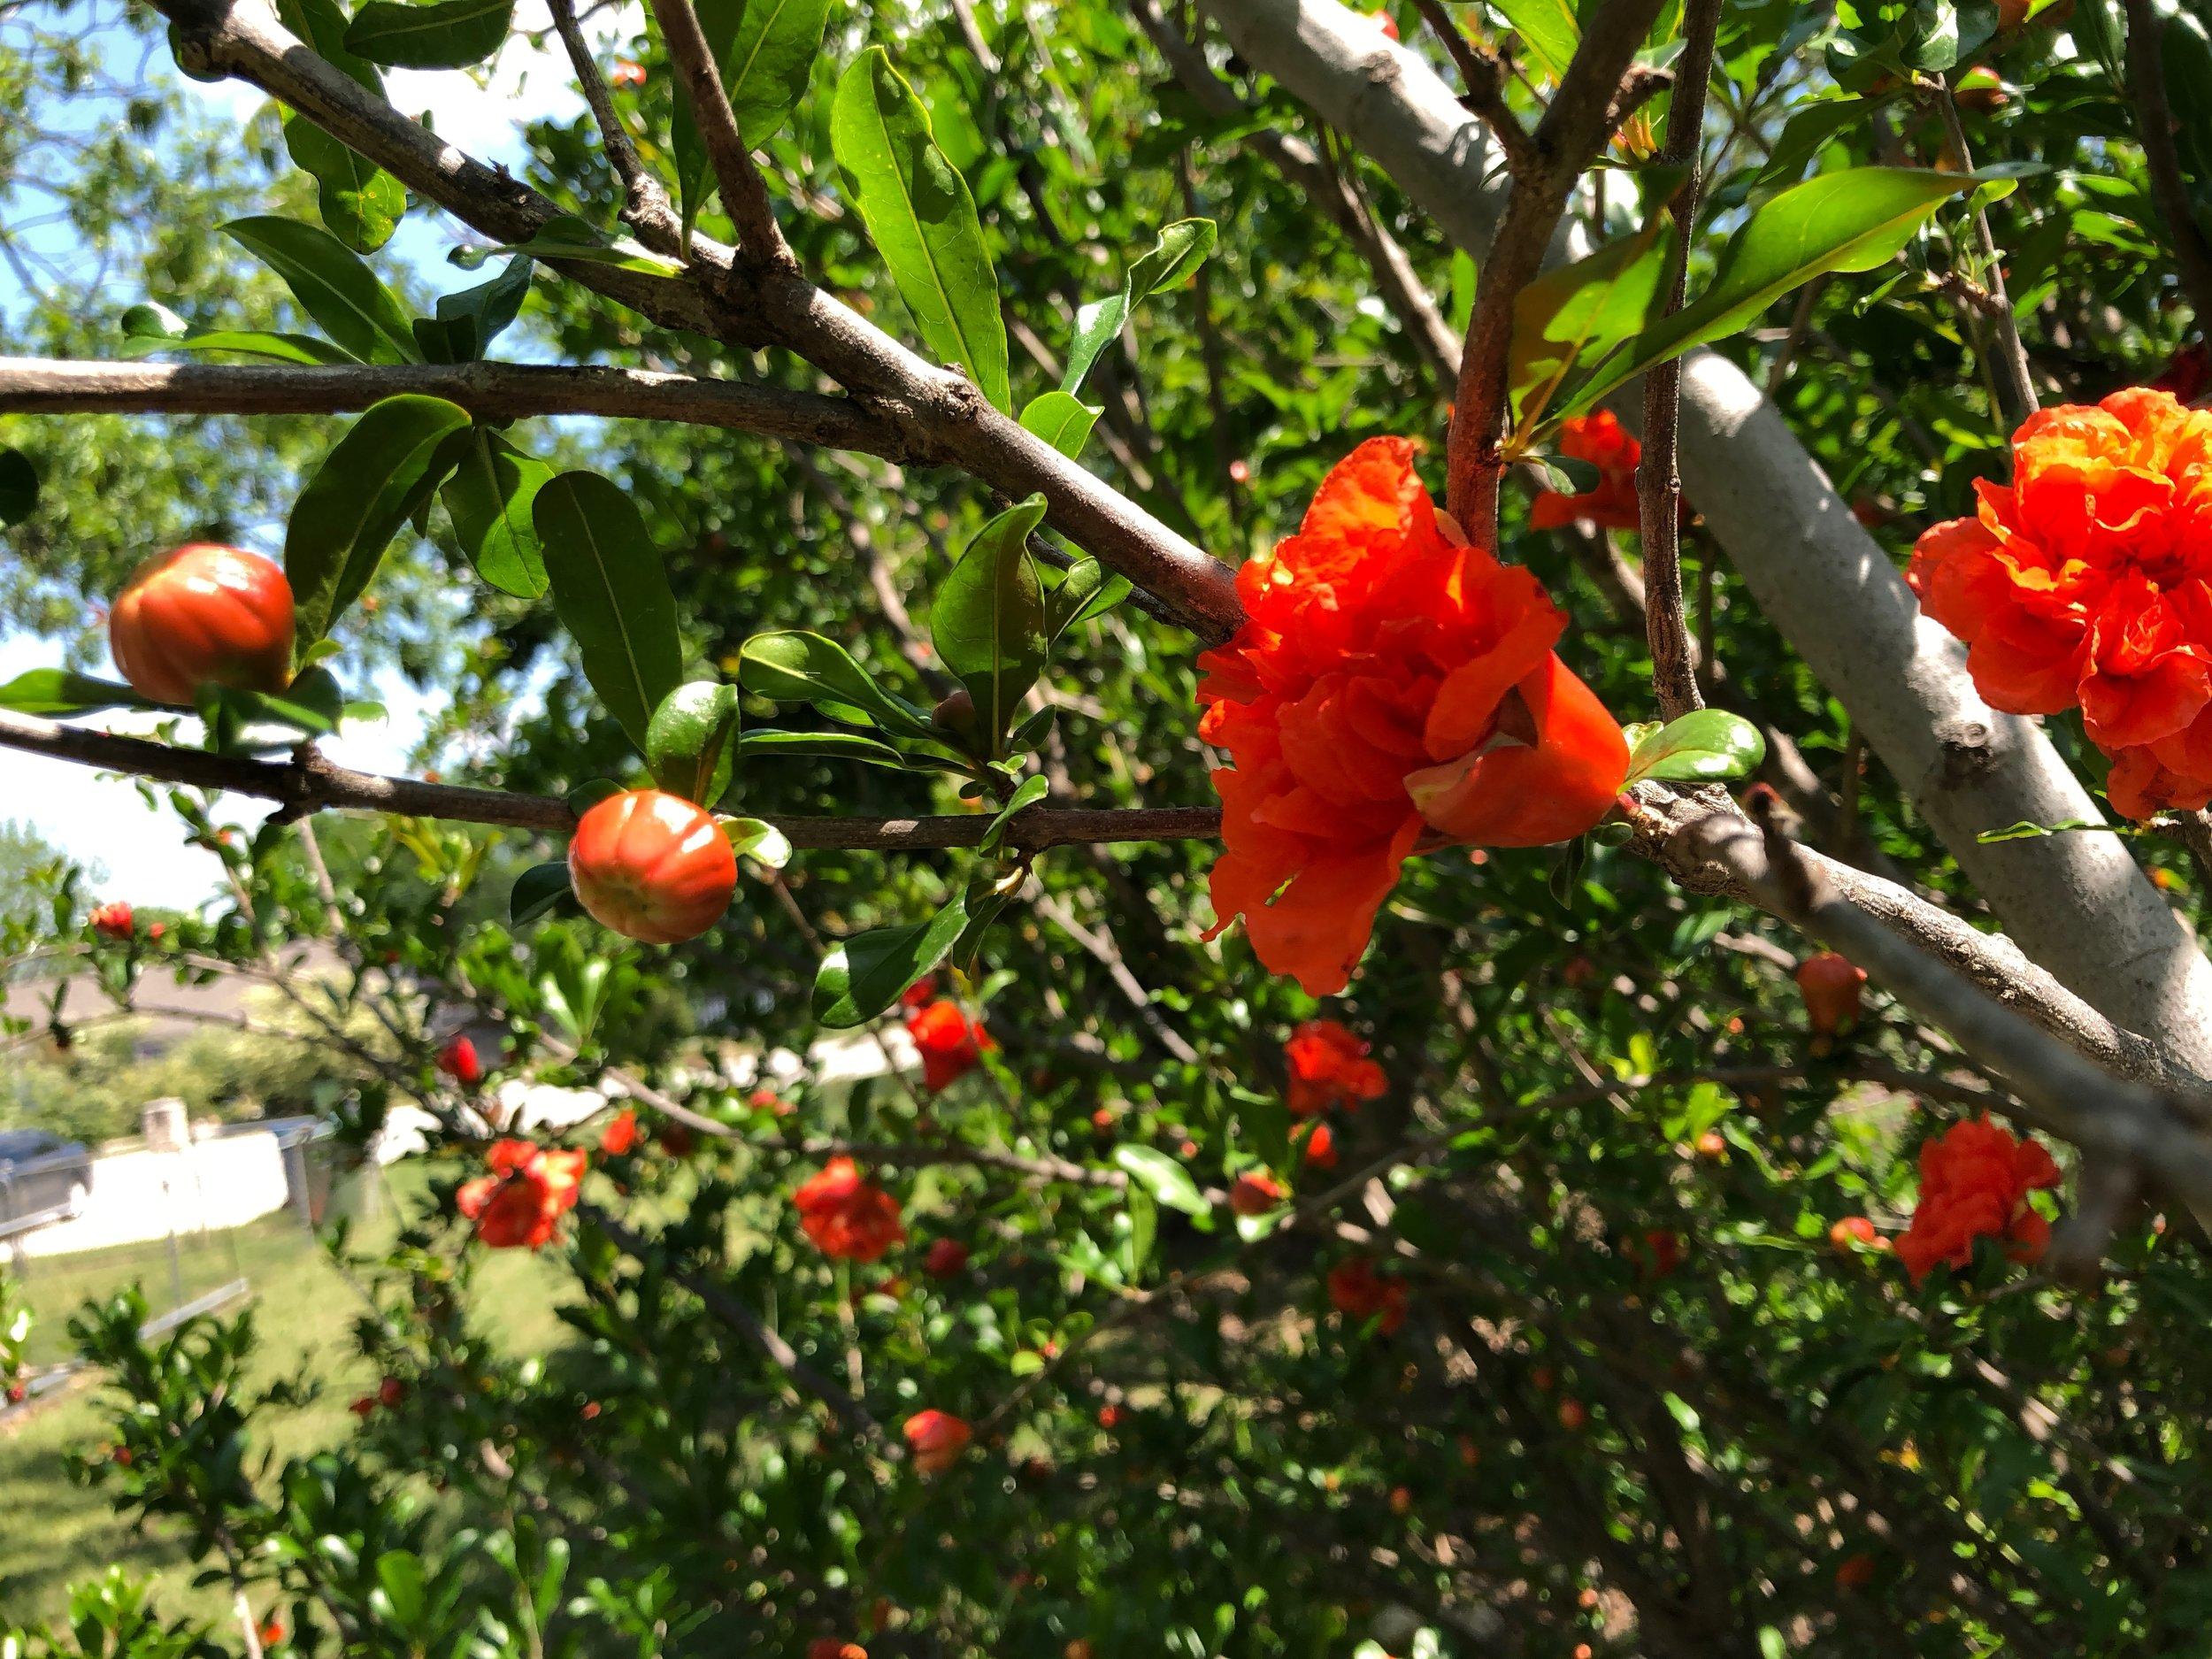 Pomegranates in bloom